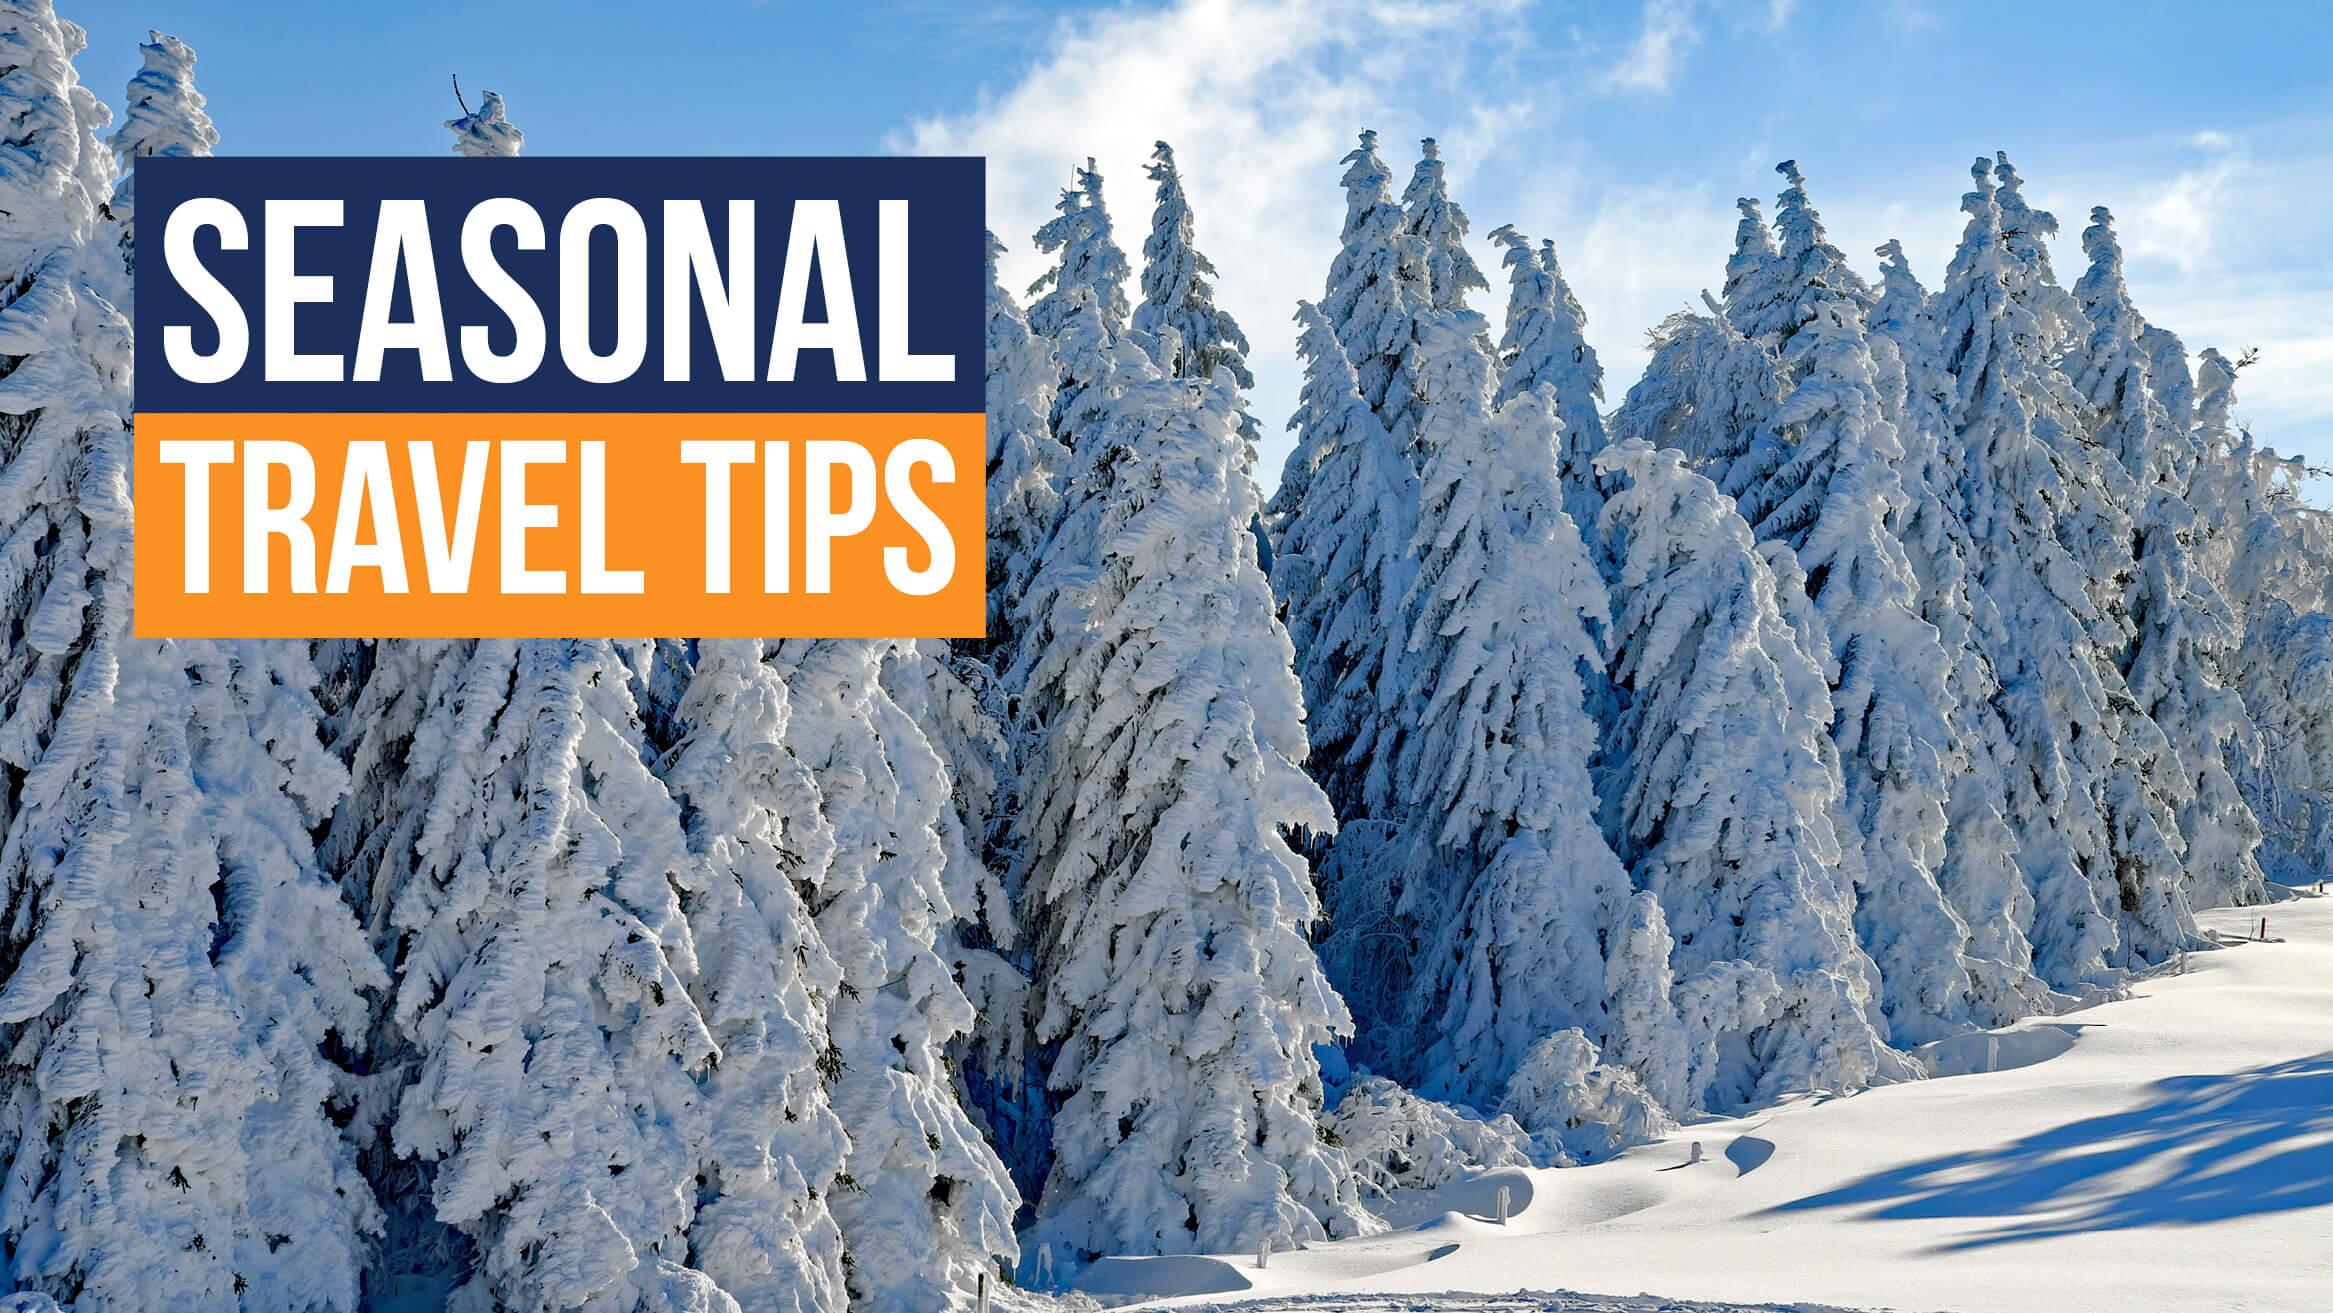 Seasonal travel tips header